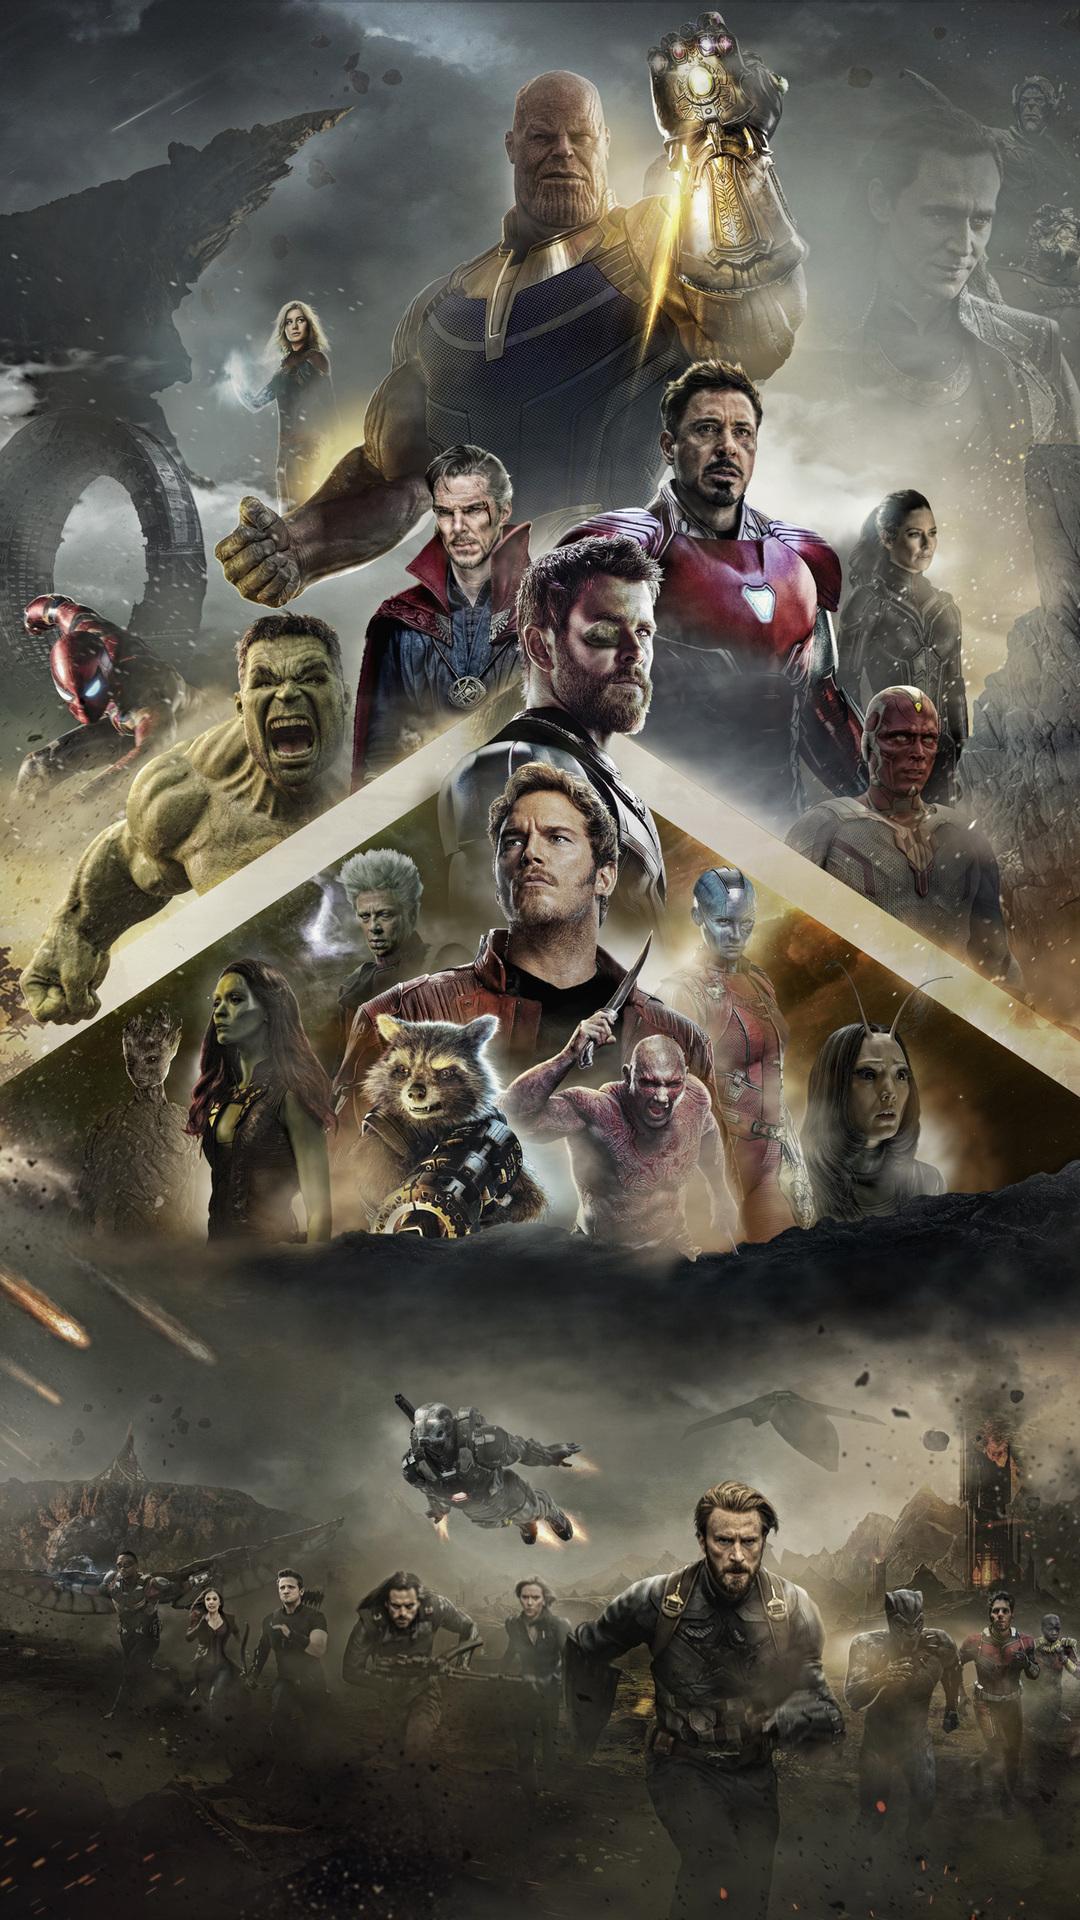 1080x1920 avengers infinity war 2018 poster iphone 7 6s 6 - Avengers infinity war wallpaper iphone ...